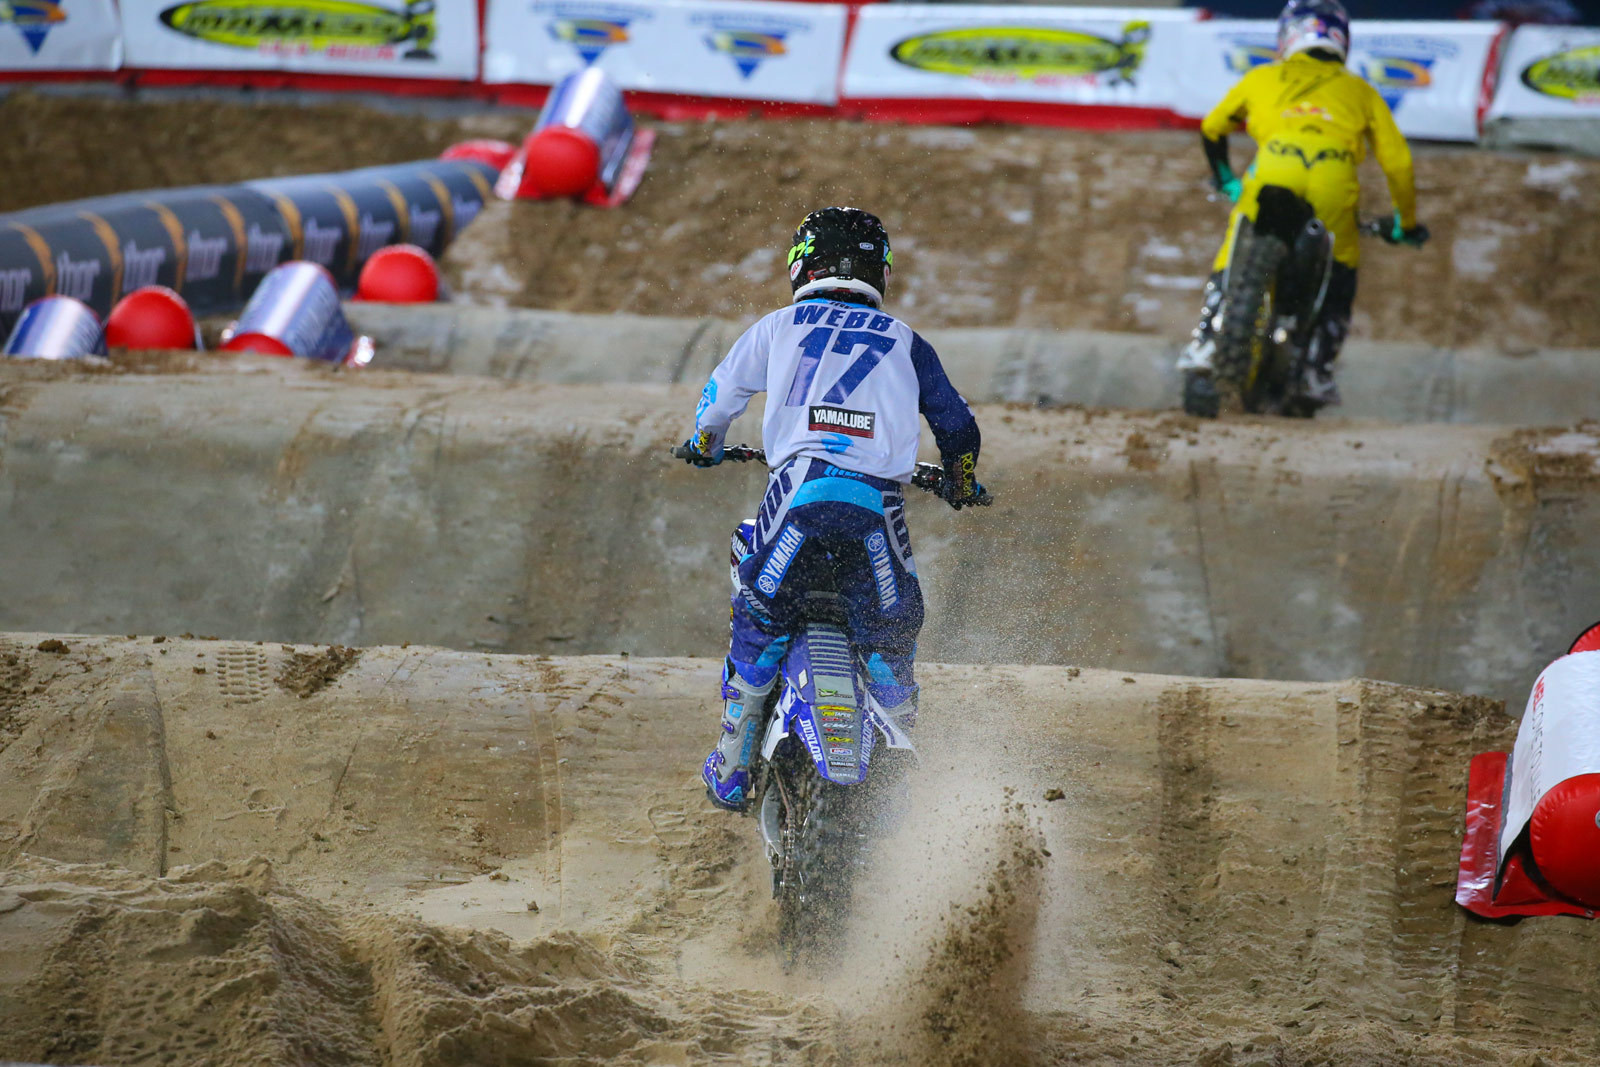 Cooper Webb - Supercross Paris-Lille: Press Day - Motocross Pictures - Vital MX